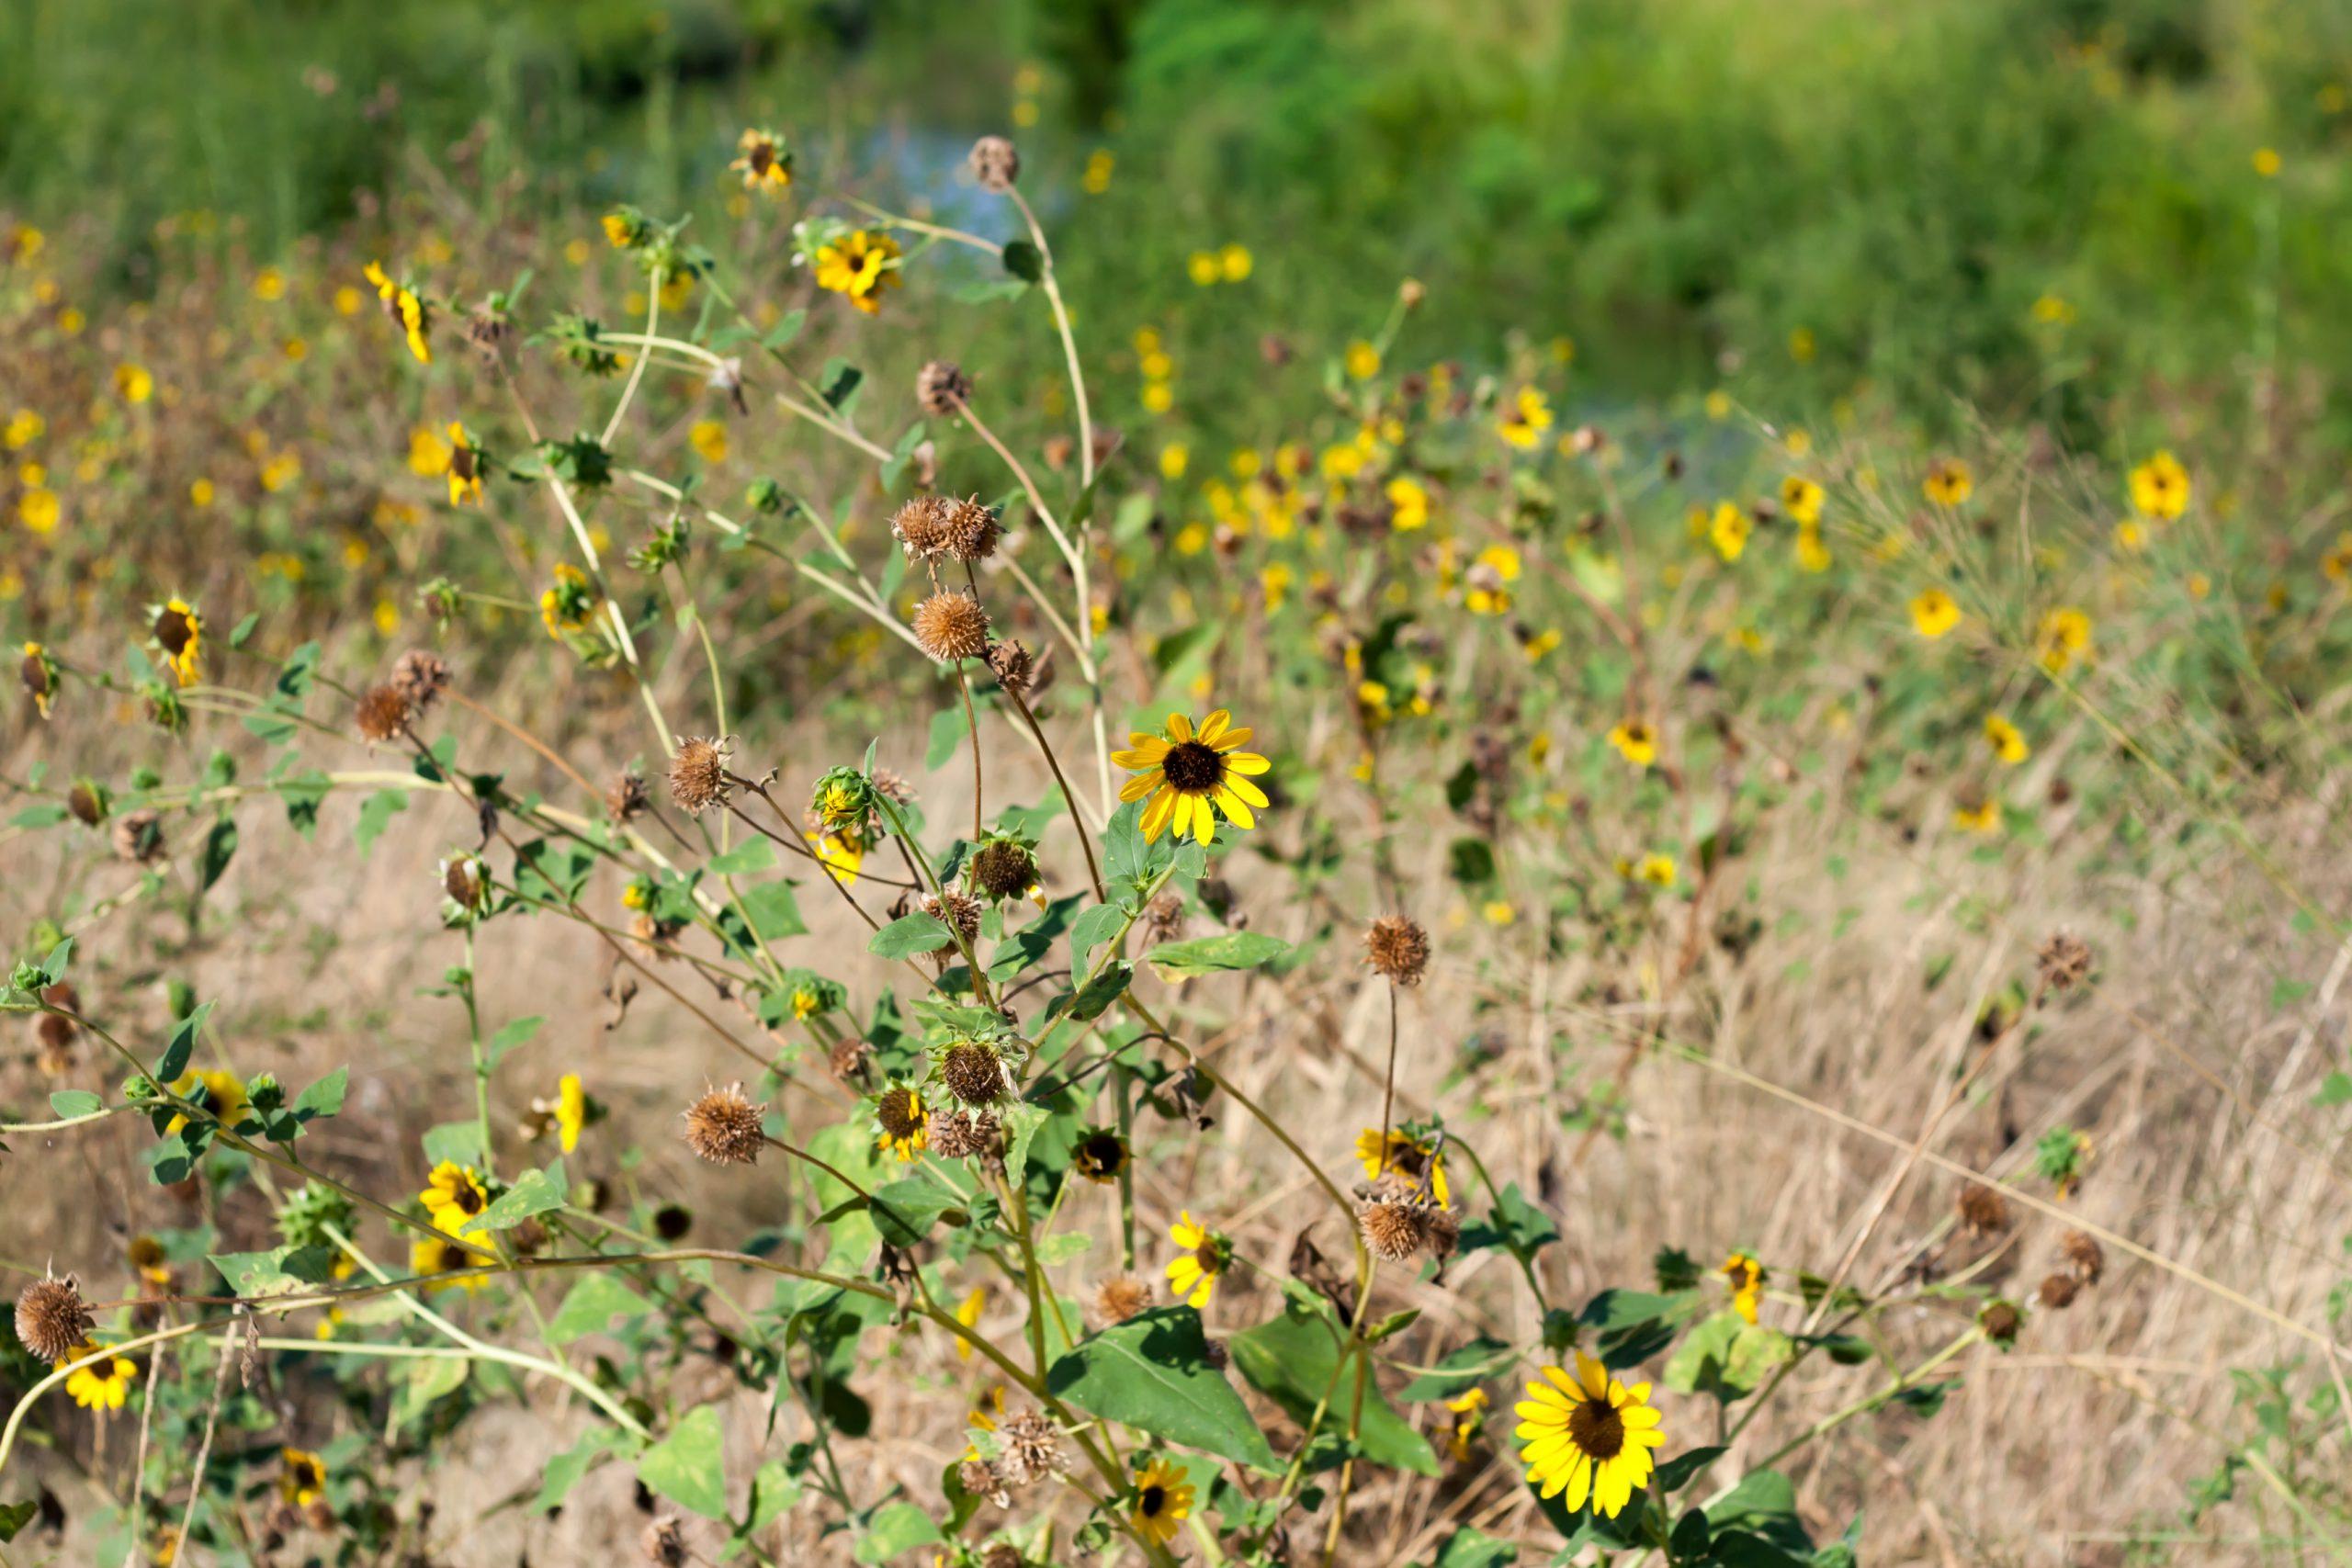 Wildflowers on the banks of the San Antonio River. Photo by Garrett Heath.